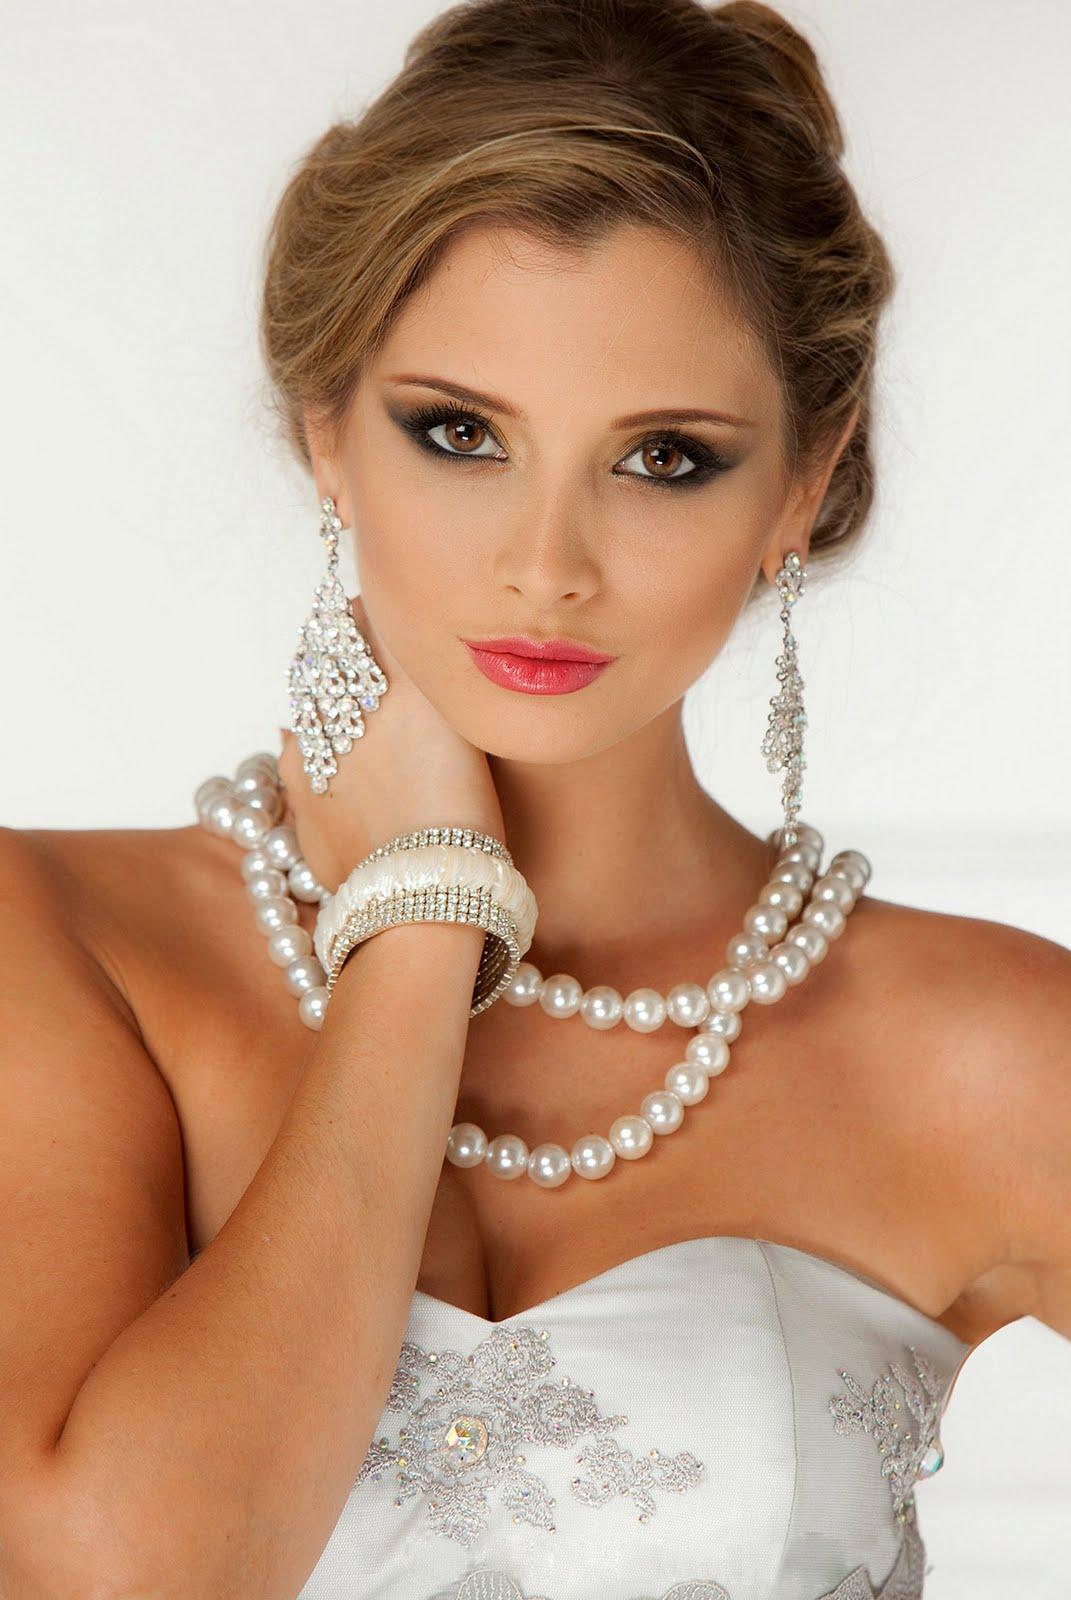 Miss International Ecuador 2011,mariafernandacornejoalfaro,miss international 2011